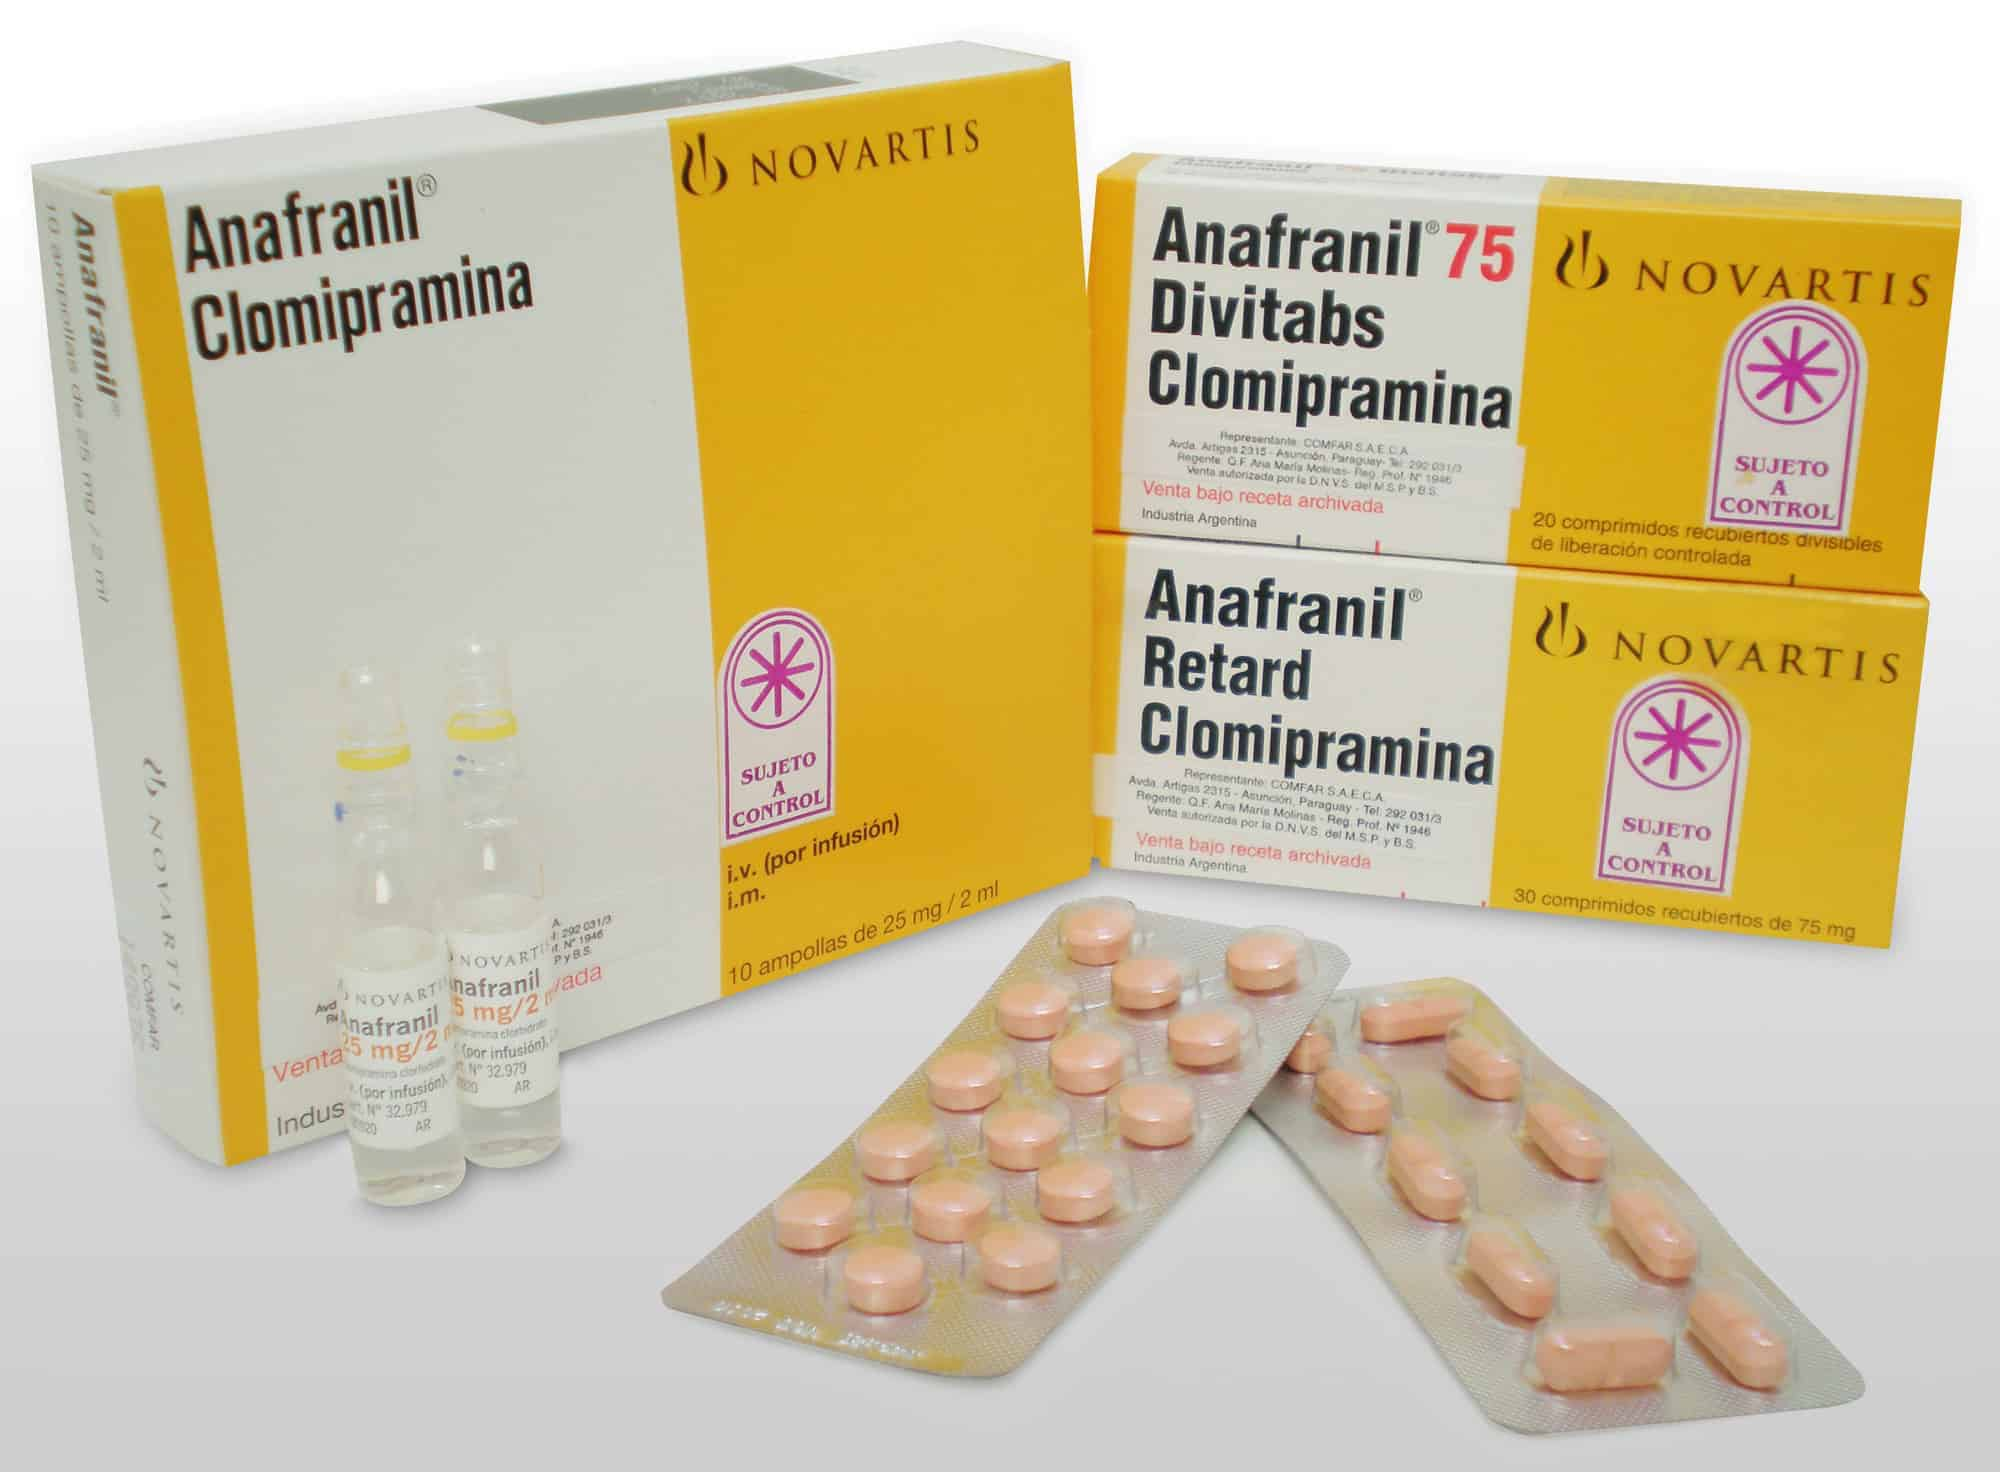 edb042d4f تجارب دواء أنافرانيل والجنس - موسوعة